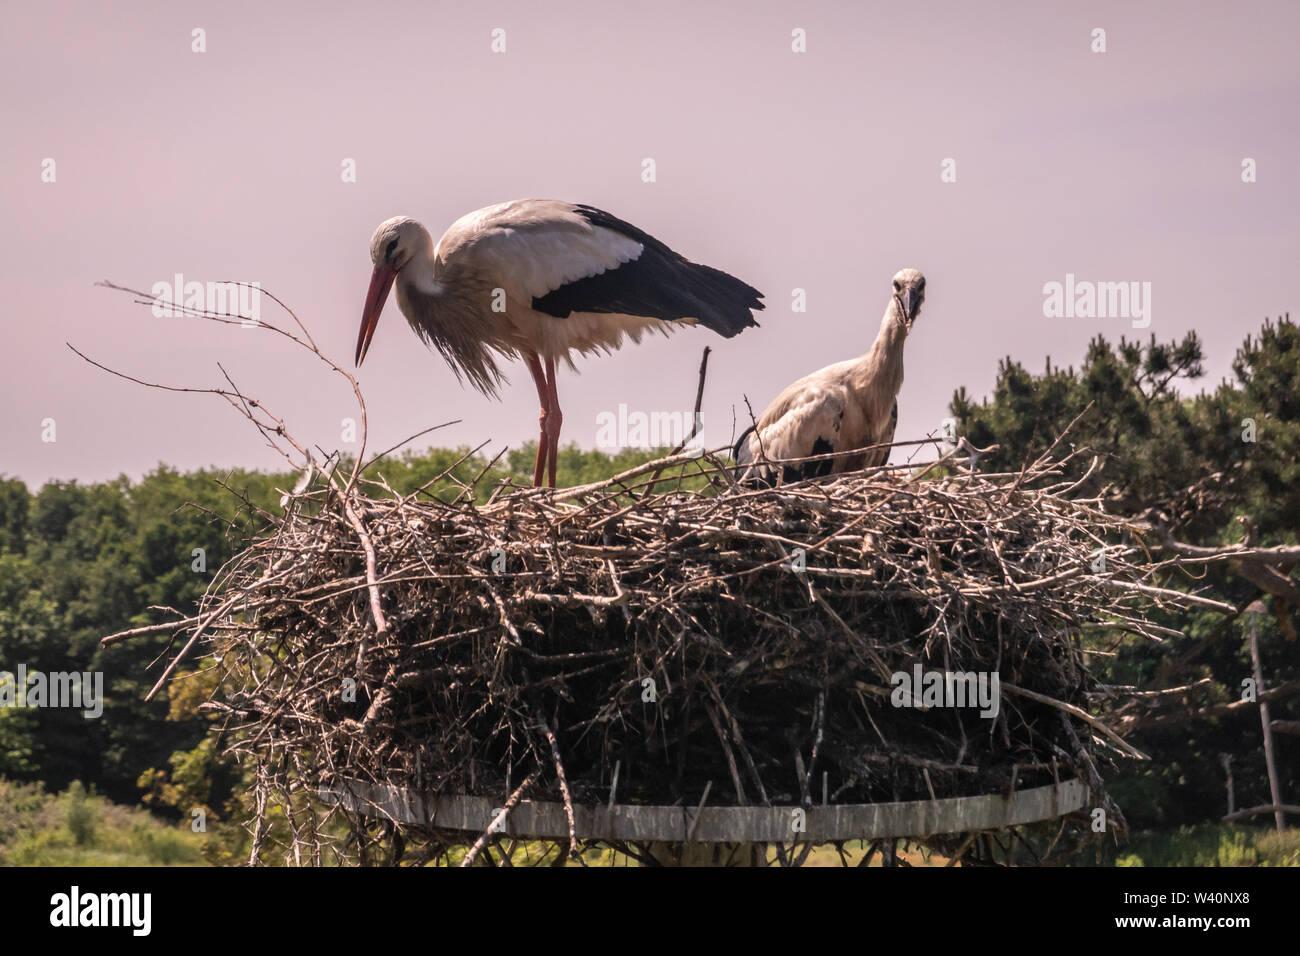 Knokke-Heist, Flanders, Belgium -  June 18, 2019: Zwin Bird Refuge. Closeup of adult stork and chick storks sitting on nest made on top of pillar agai - Stock Image